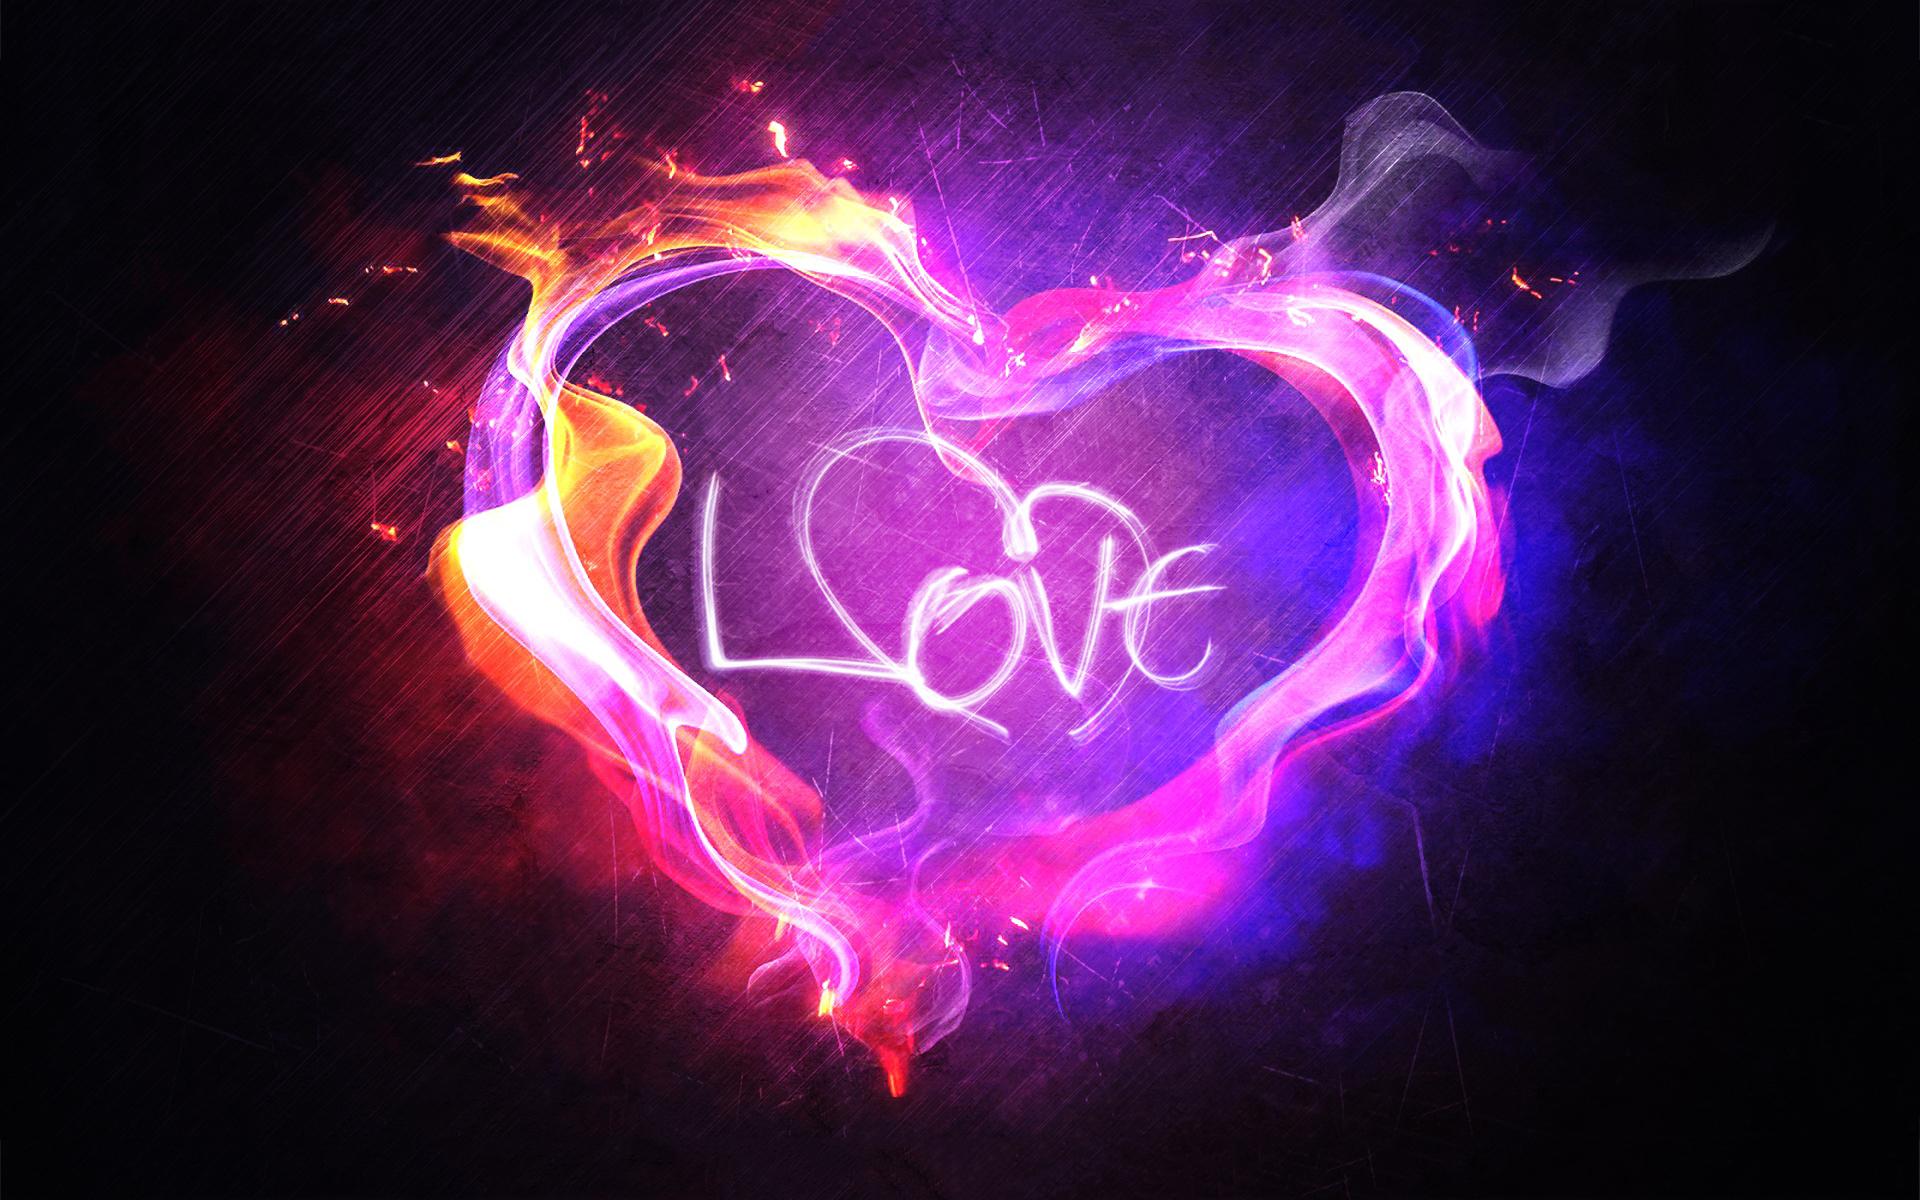 Heart love flame wallpaper 1920x1200 28033 1920x1200